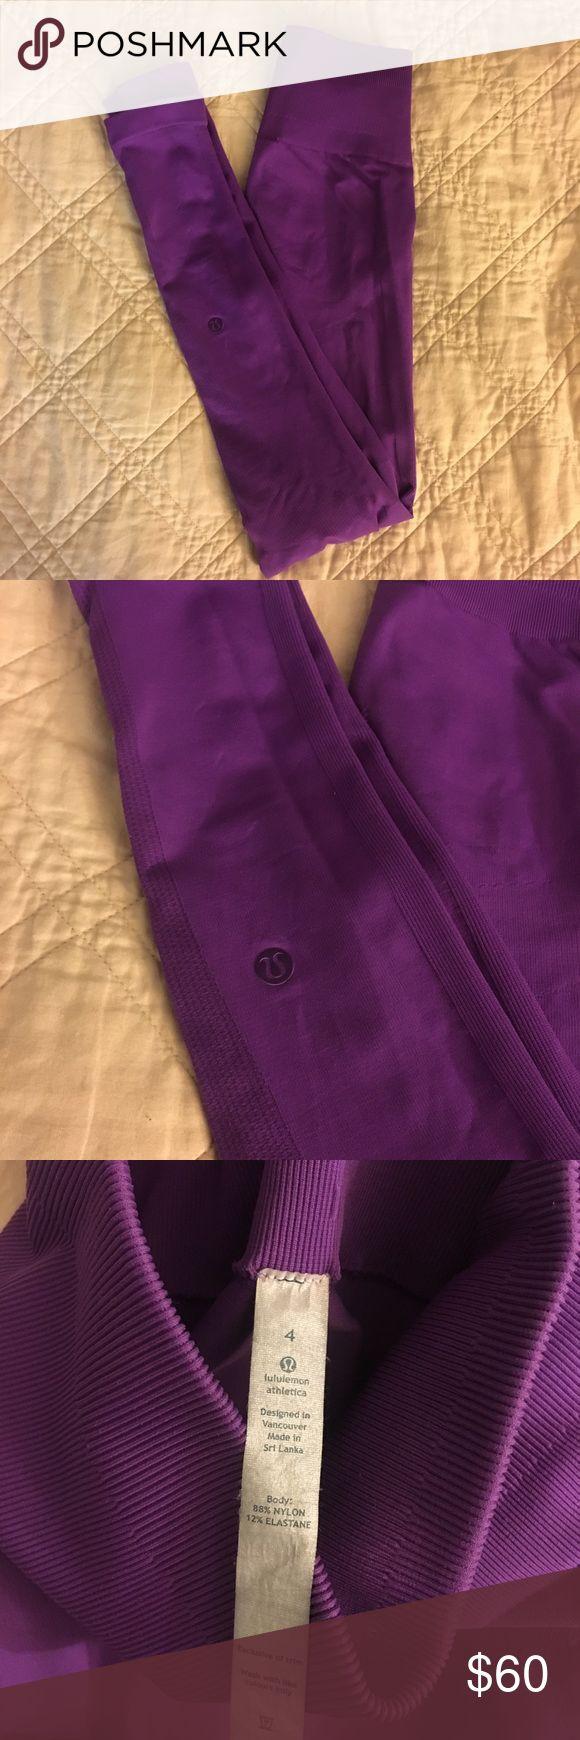 Lululemon athletica leggings - seamless size 4 Lightly used, no signs of wear lululemon athletica seamless leggings. Purple, size 4. lululemon athletica Pants Leggings